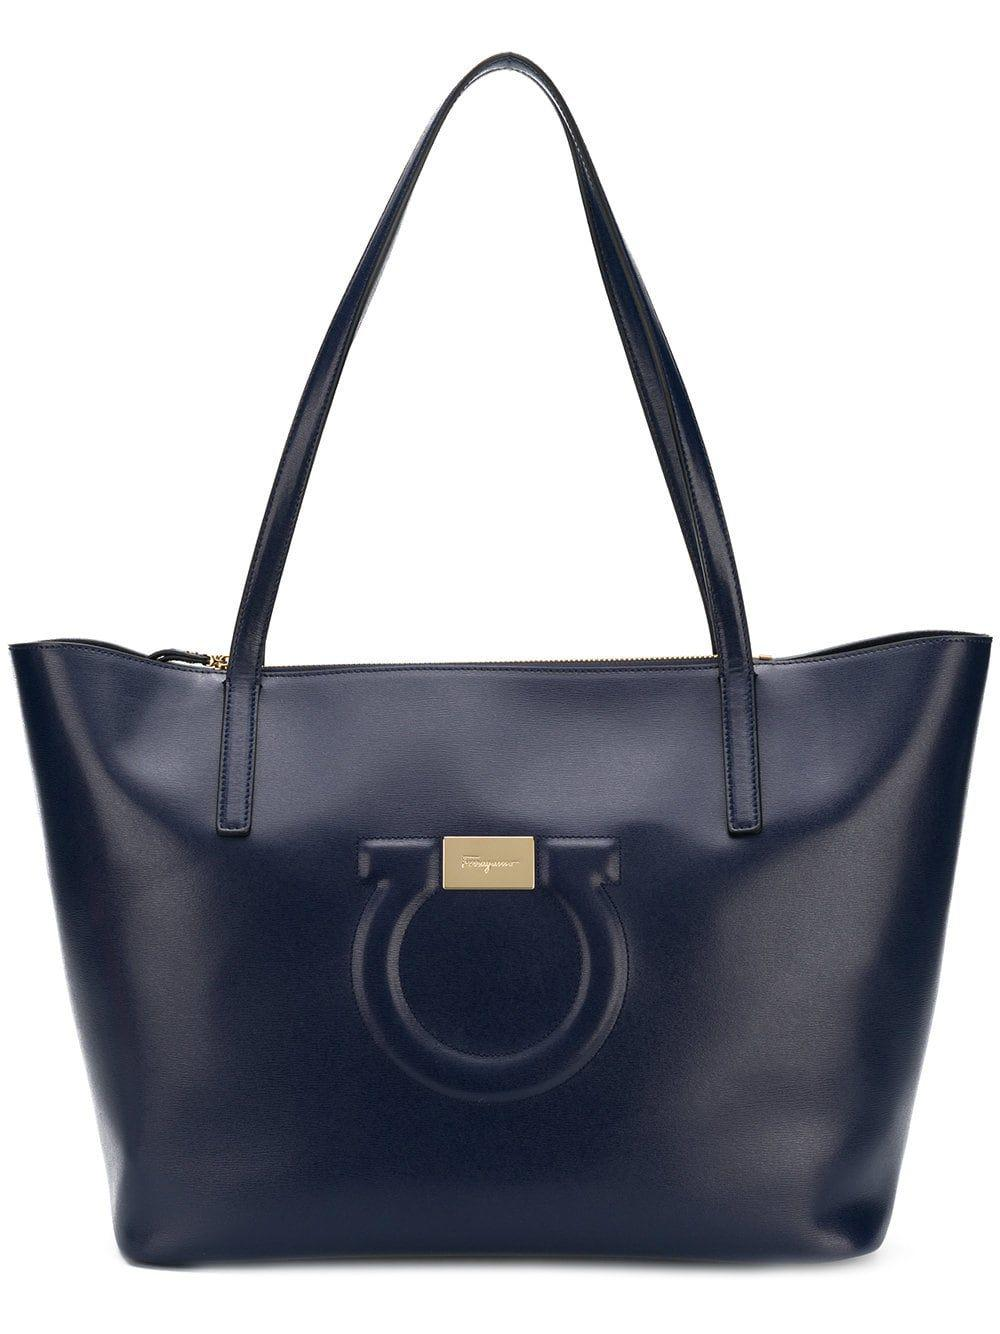 e366a658232d Lyst - Ferragamo Women s Blue Leather Tote in Blue